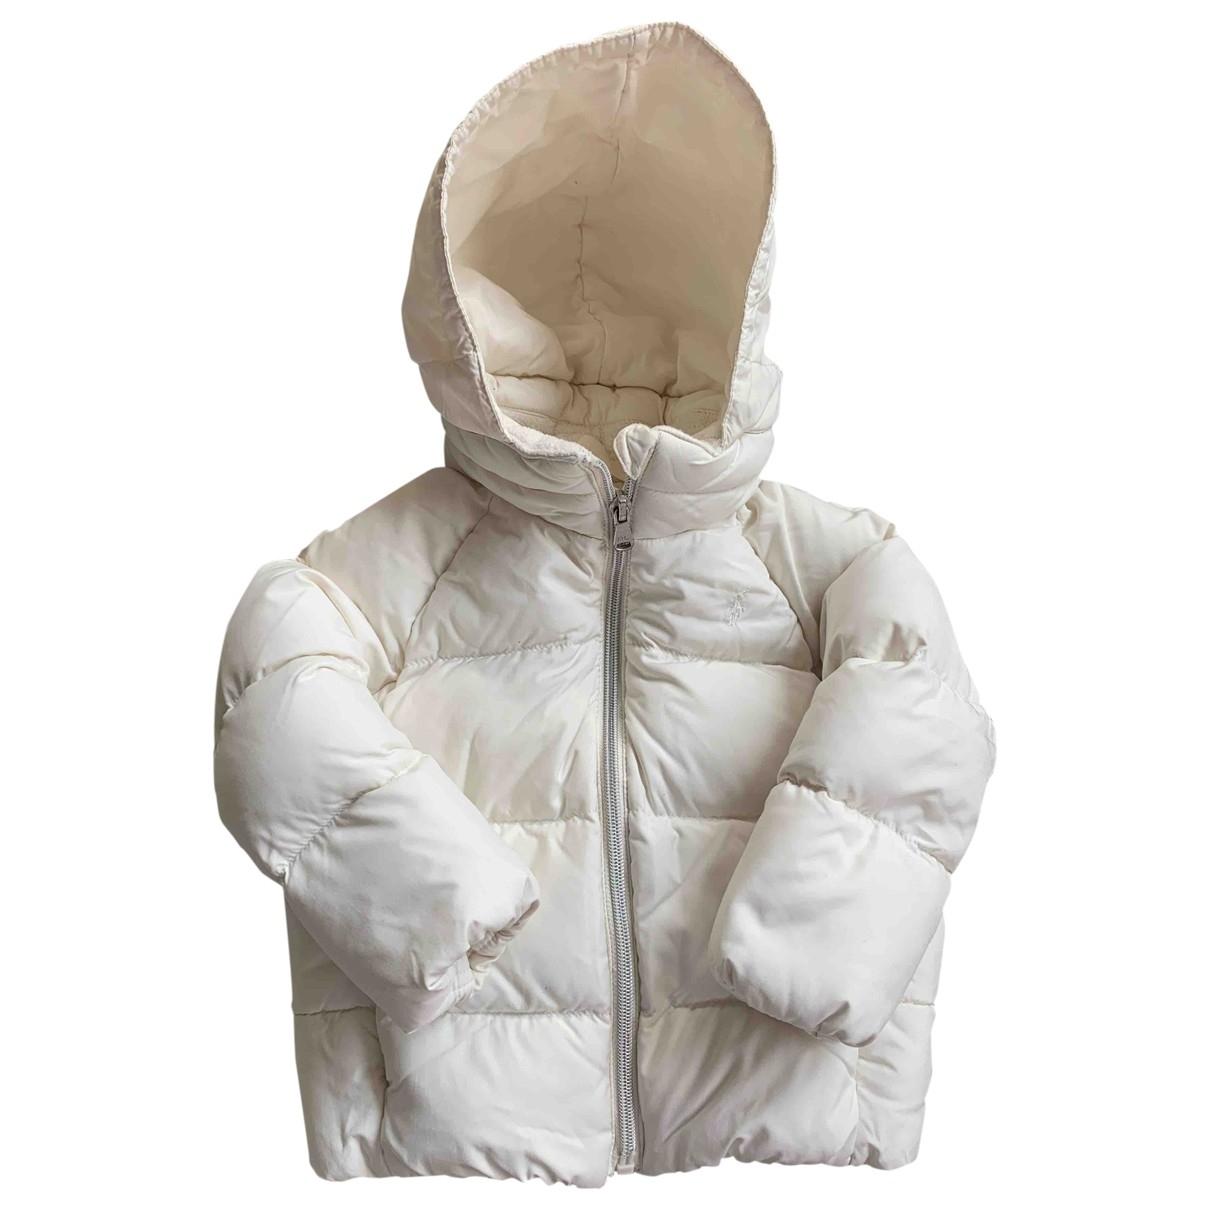 Ralph Lauren \N White Fur jacket & coat for Kids 2 years - until 34 inches UK